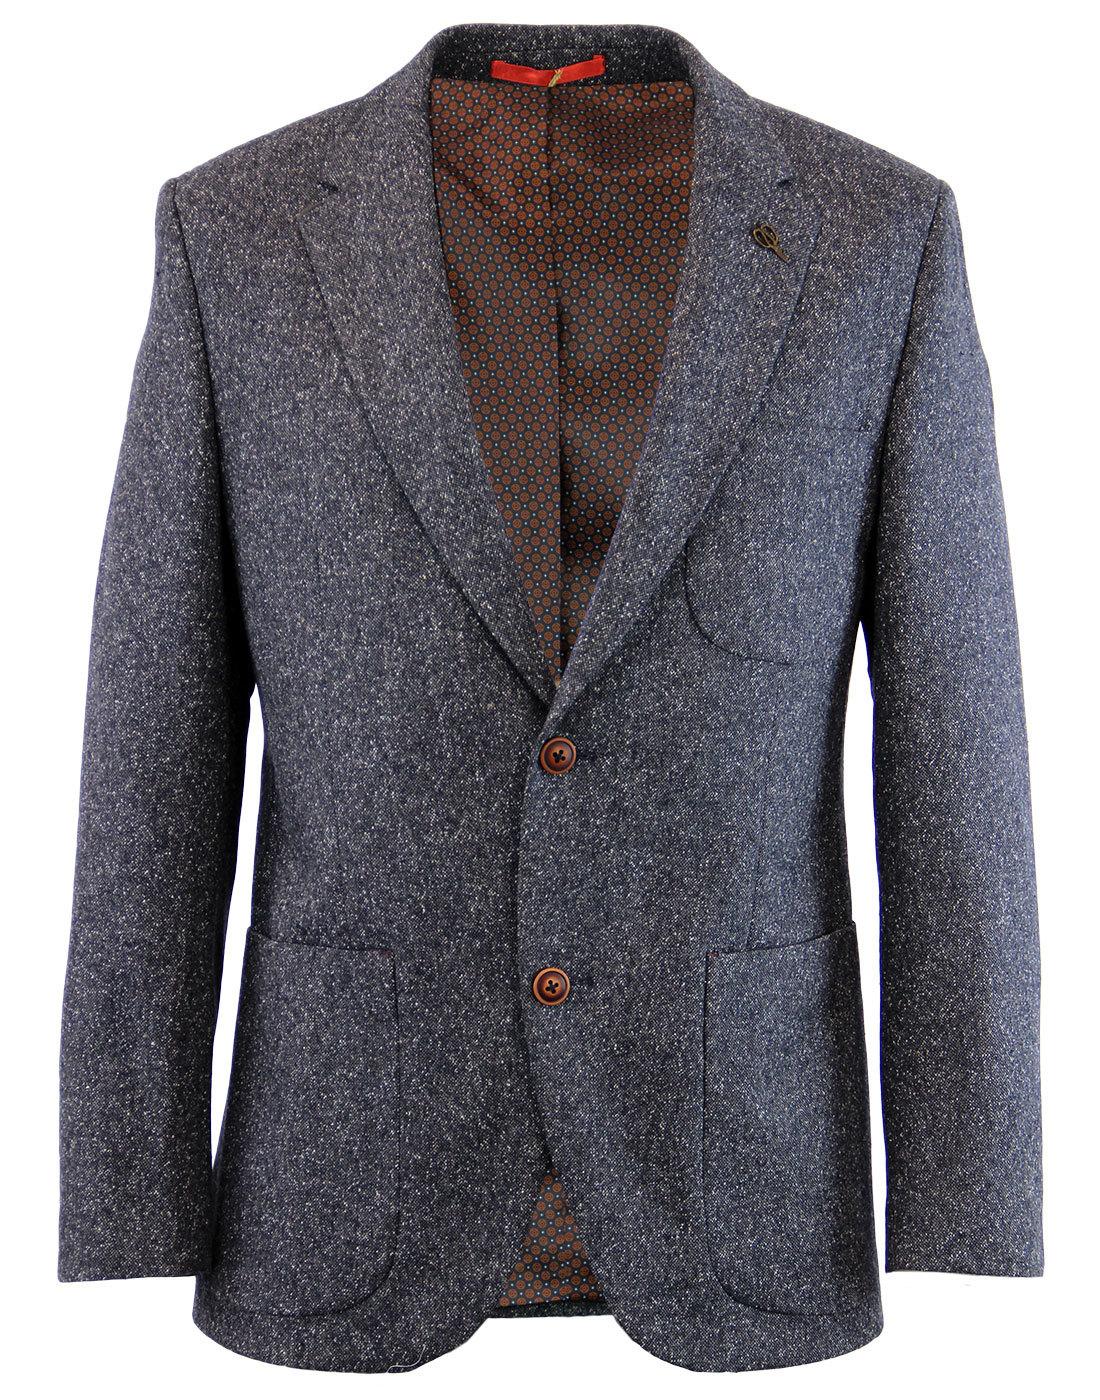 GIBSON LONDON Mod 2 Button Donegal Suit Jacket (D)